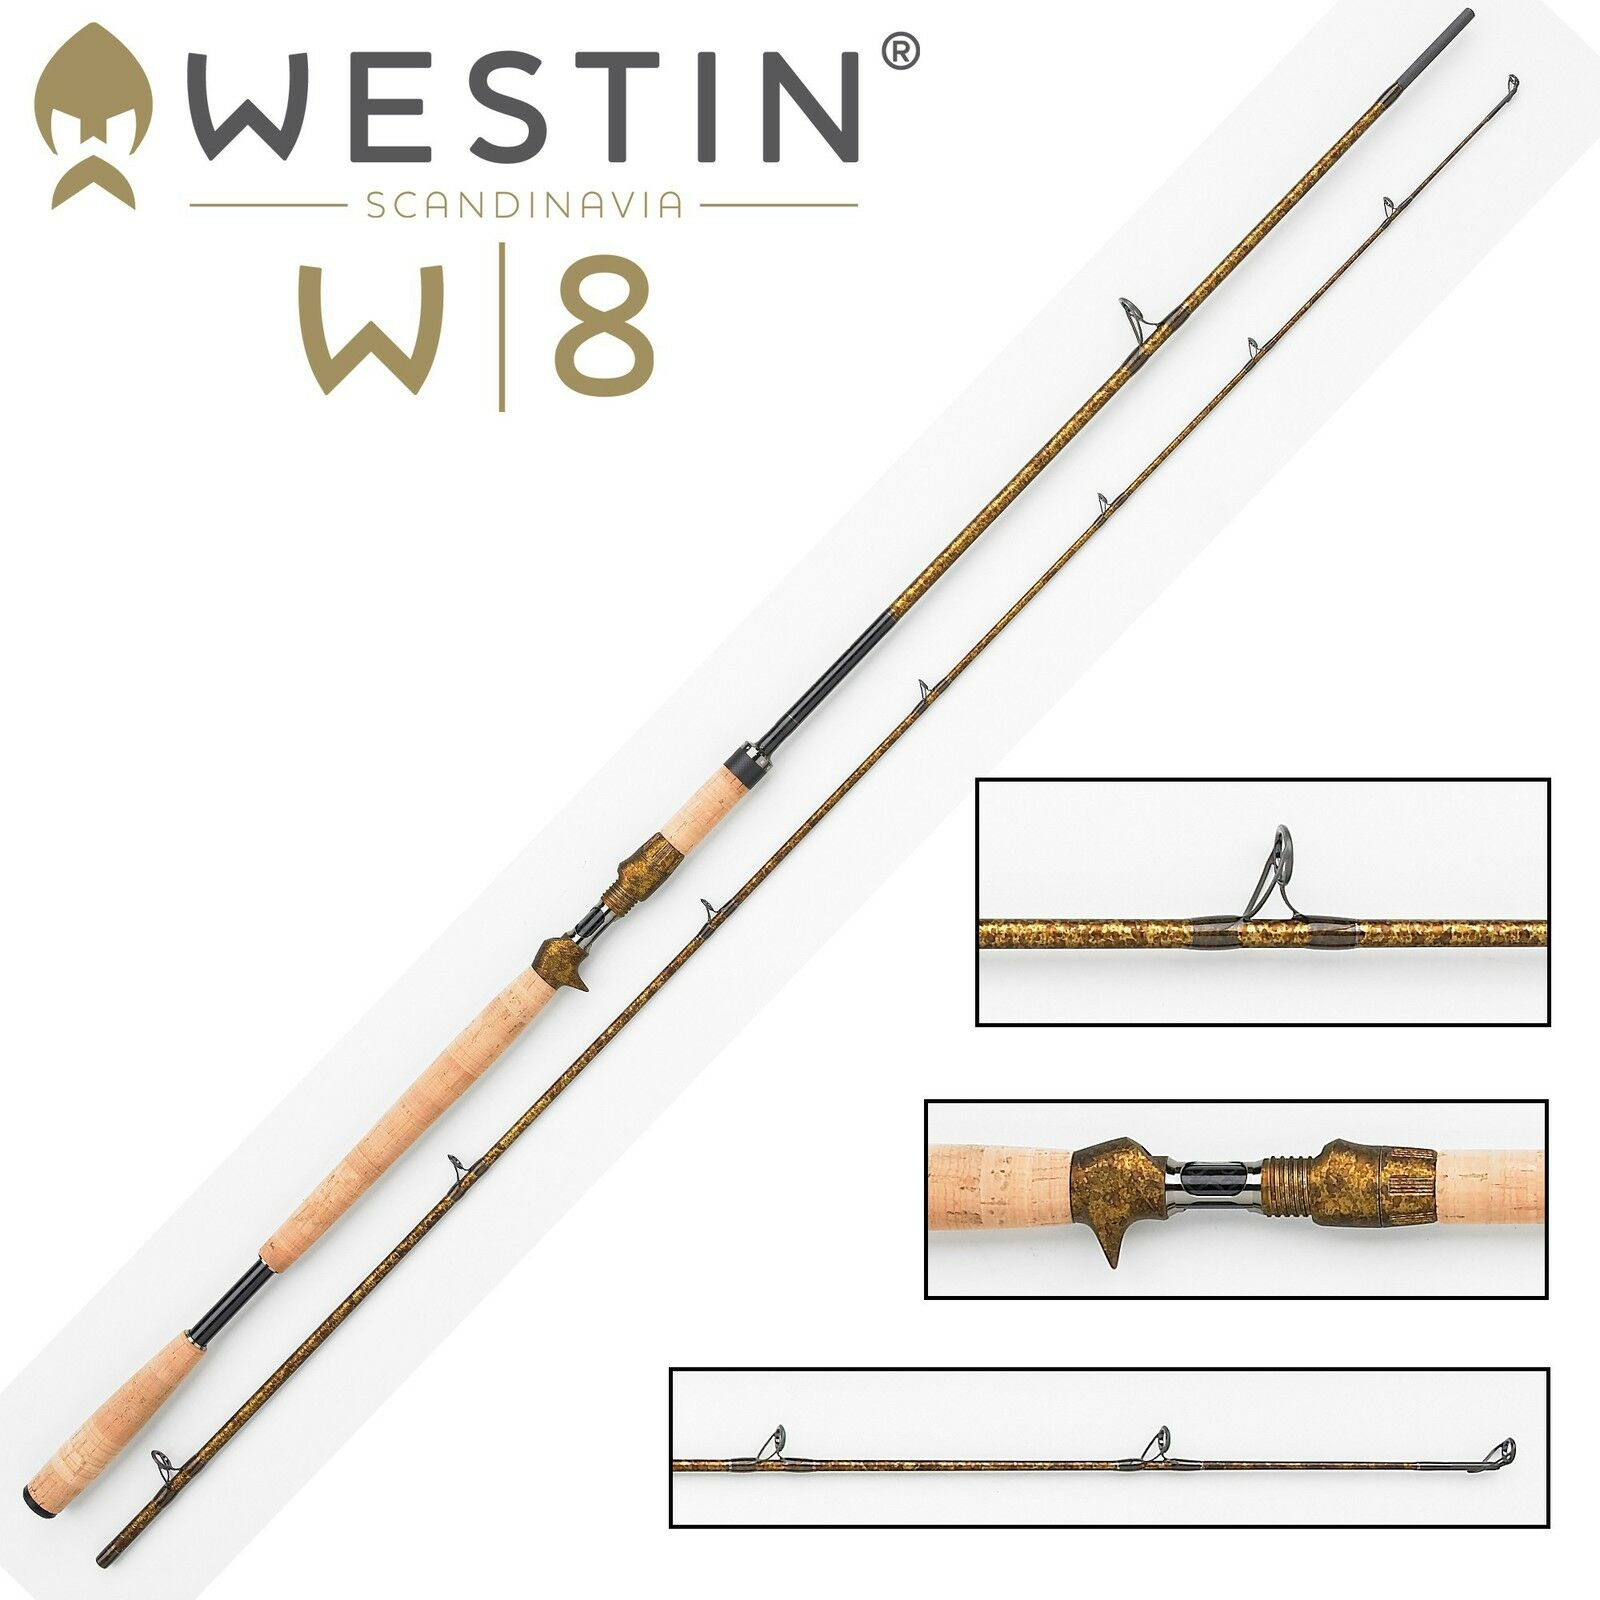 Westin W8 Powercast-T 255cm XXH 40-130g Spinnrute für Multirolle, Hechtrute